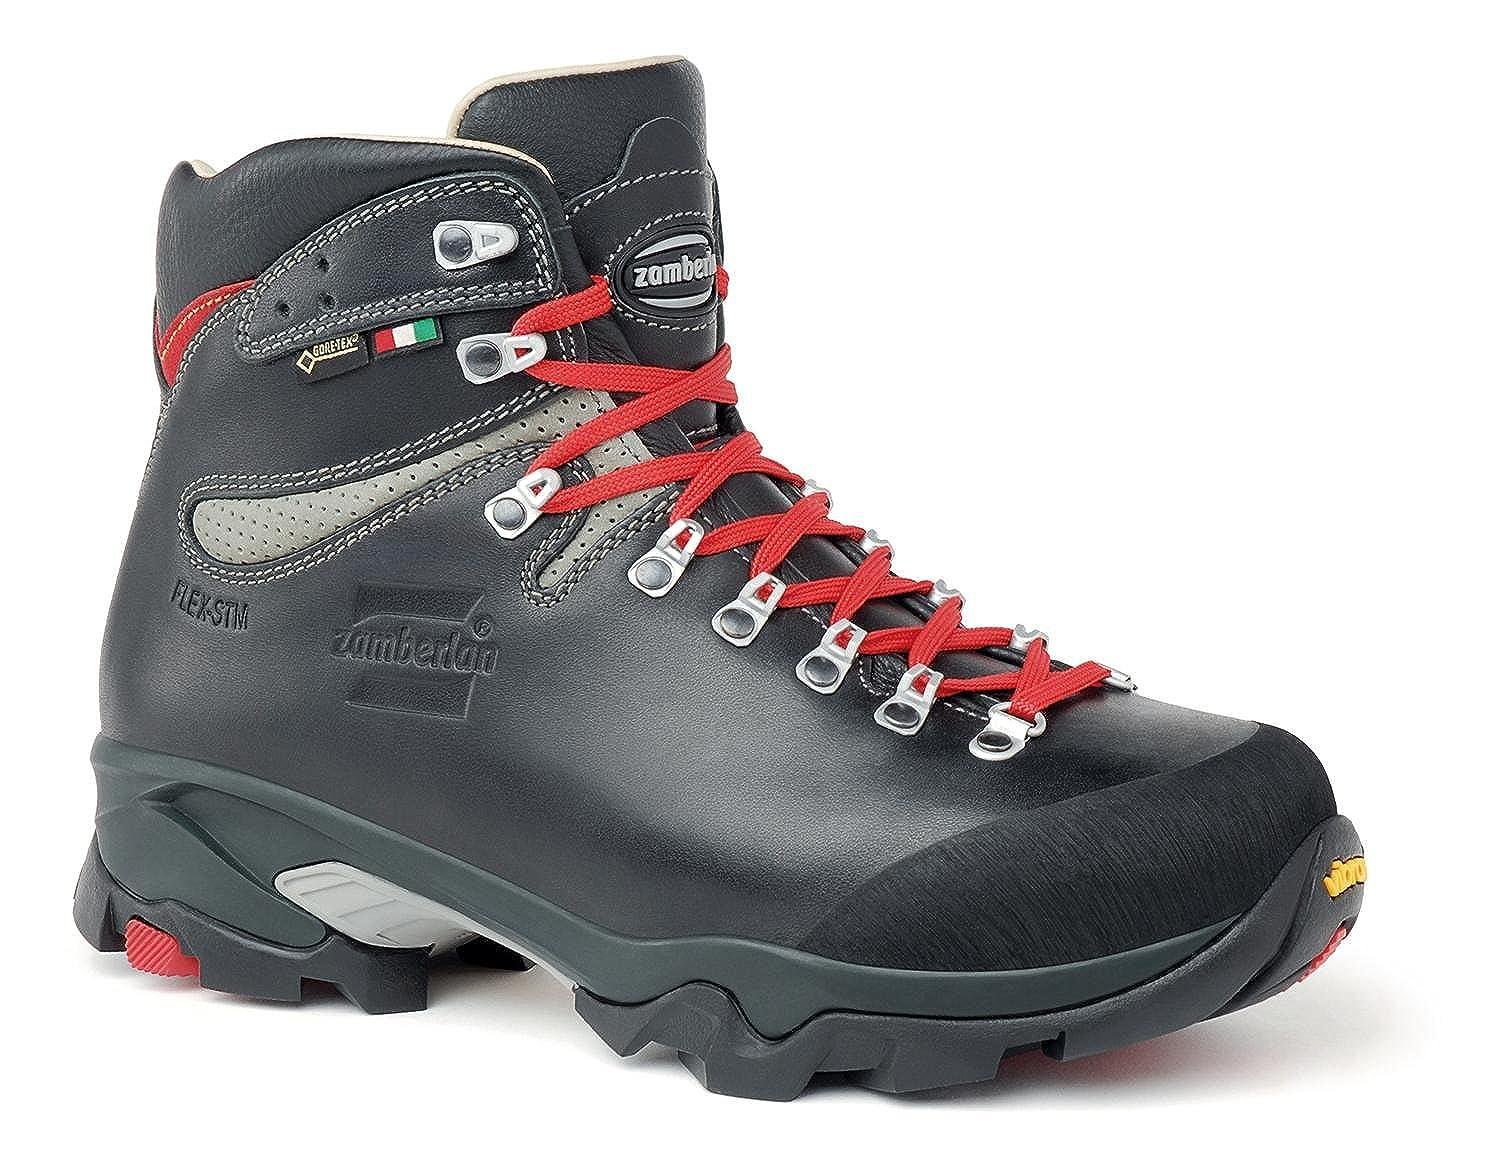 Zamberlan 10.5 Leather Backcountry Boots 1996 VIOZ lux GTX rr Waxed Black